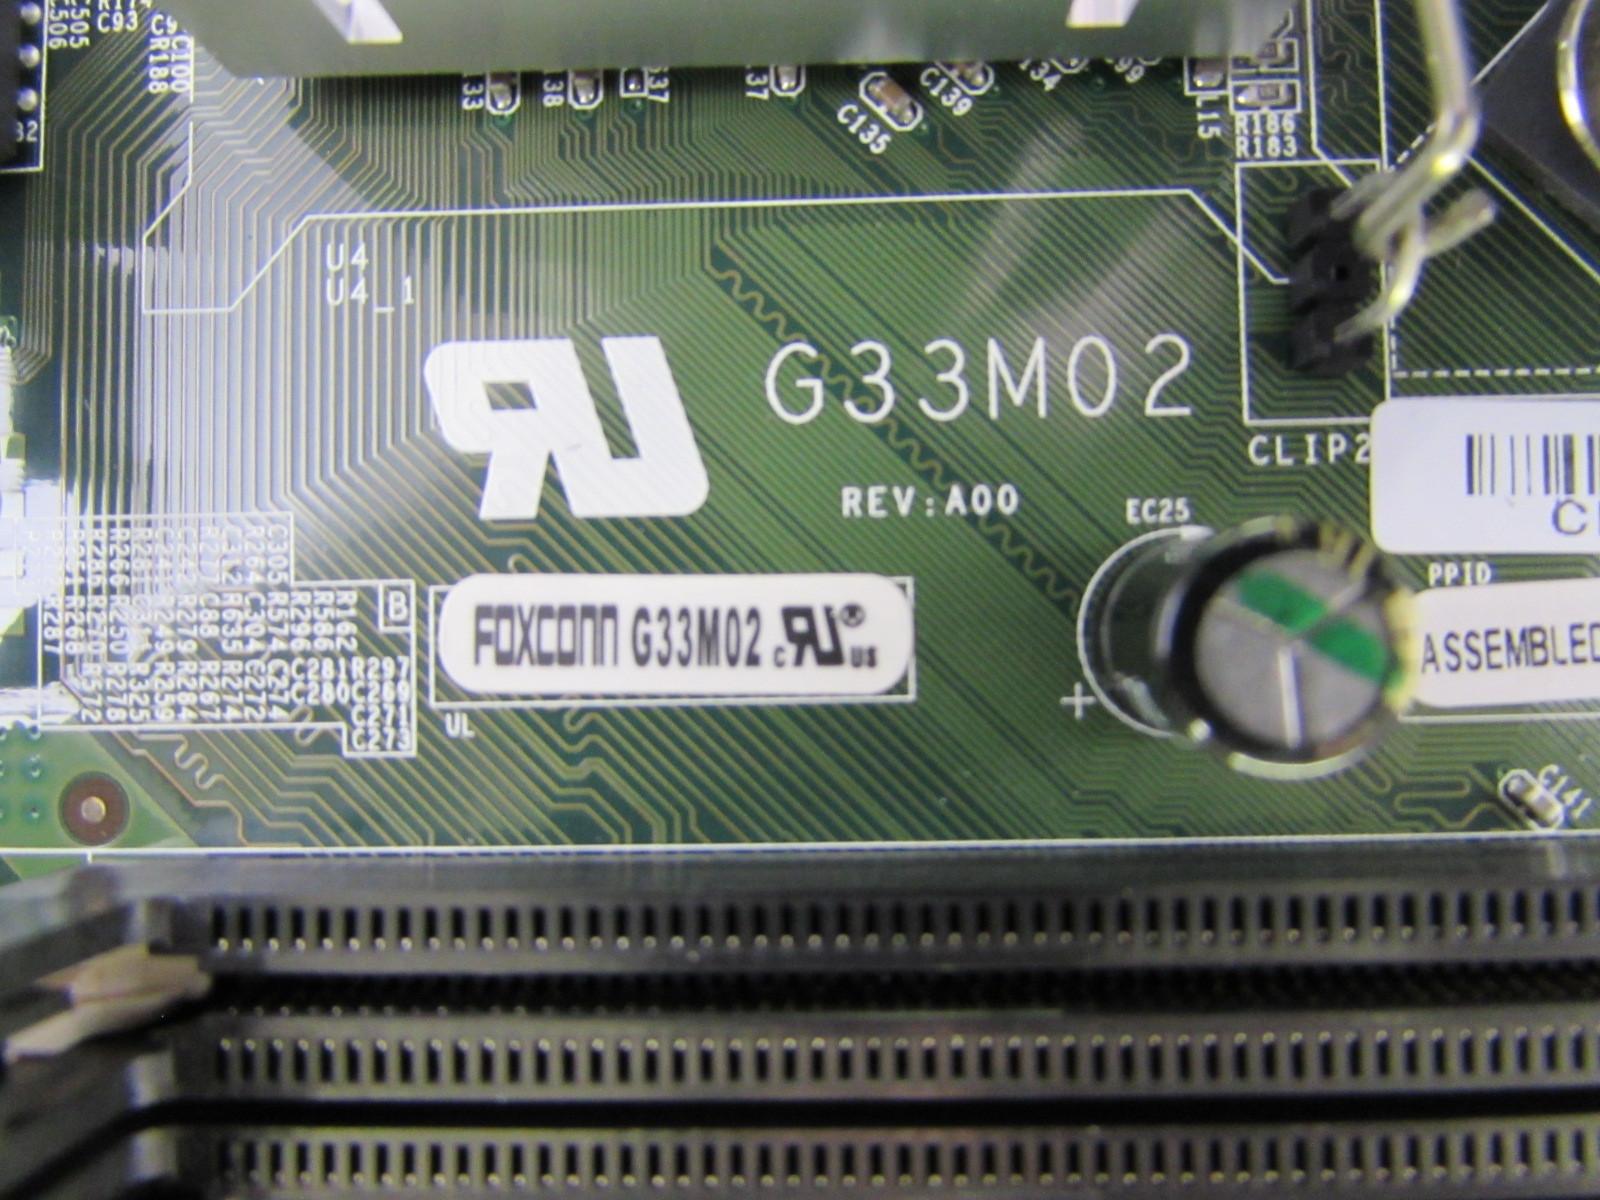 Dell Inspiron 530s G33m02 G33 Motherboard Ry007 Core 2 Duo E8200 Lga G31 Ddr2